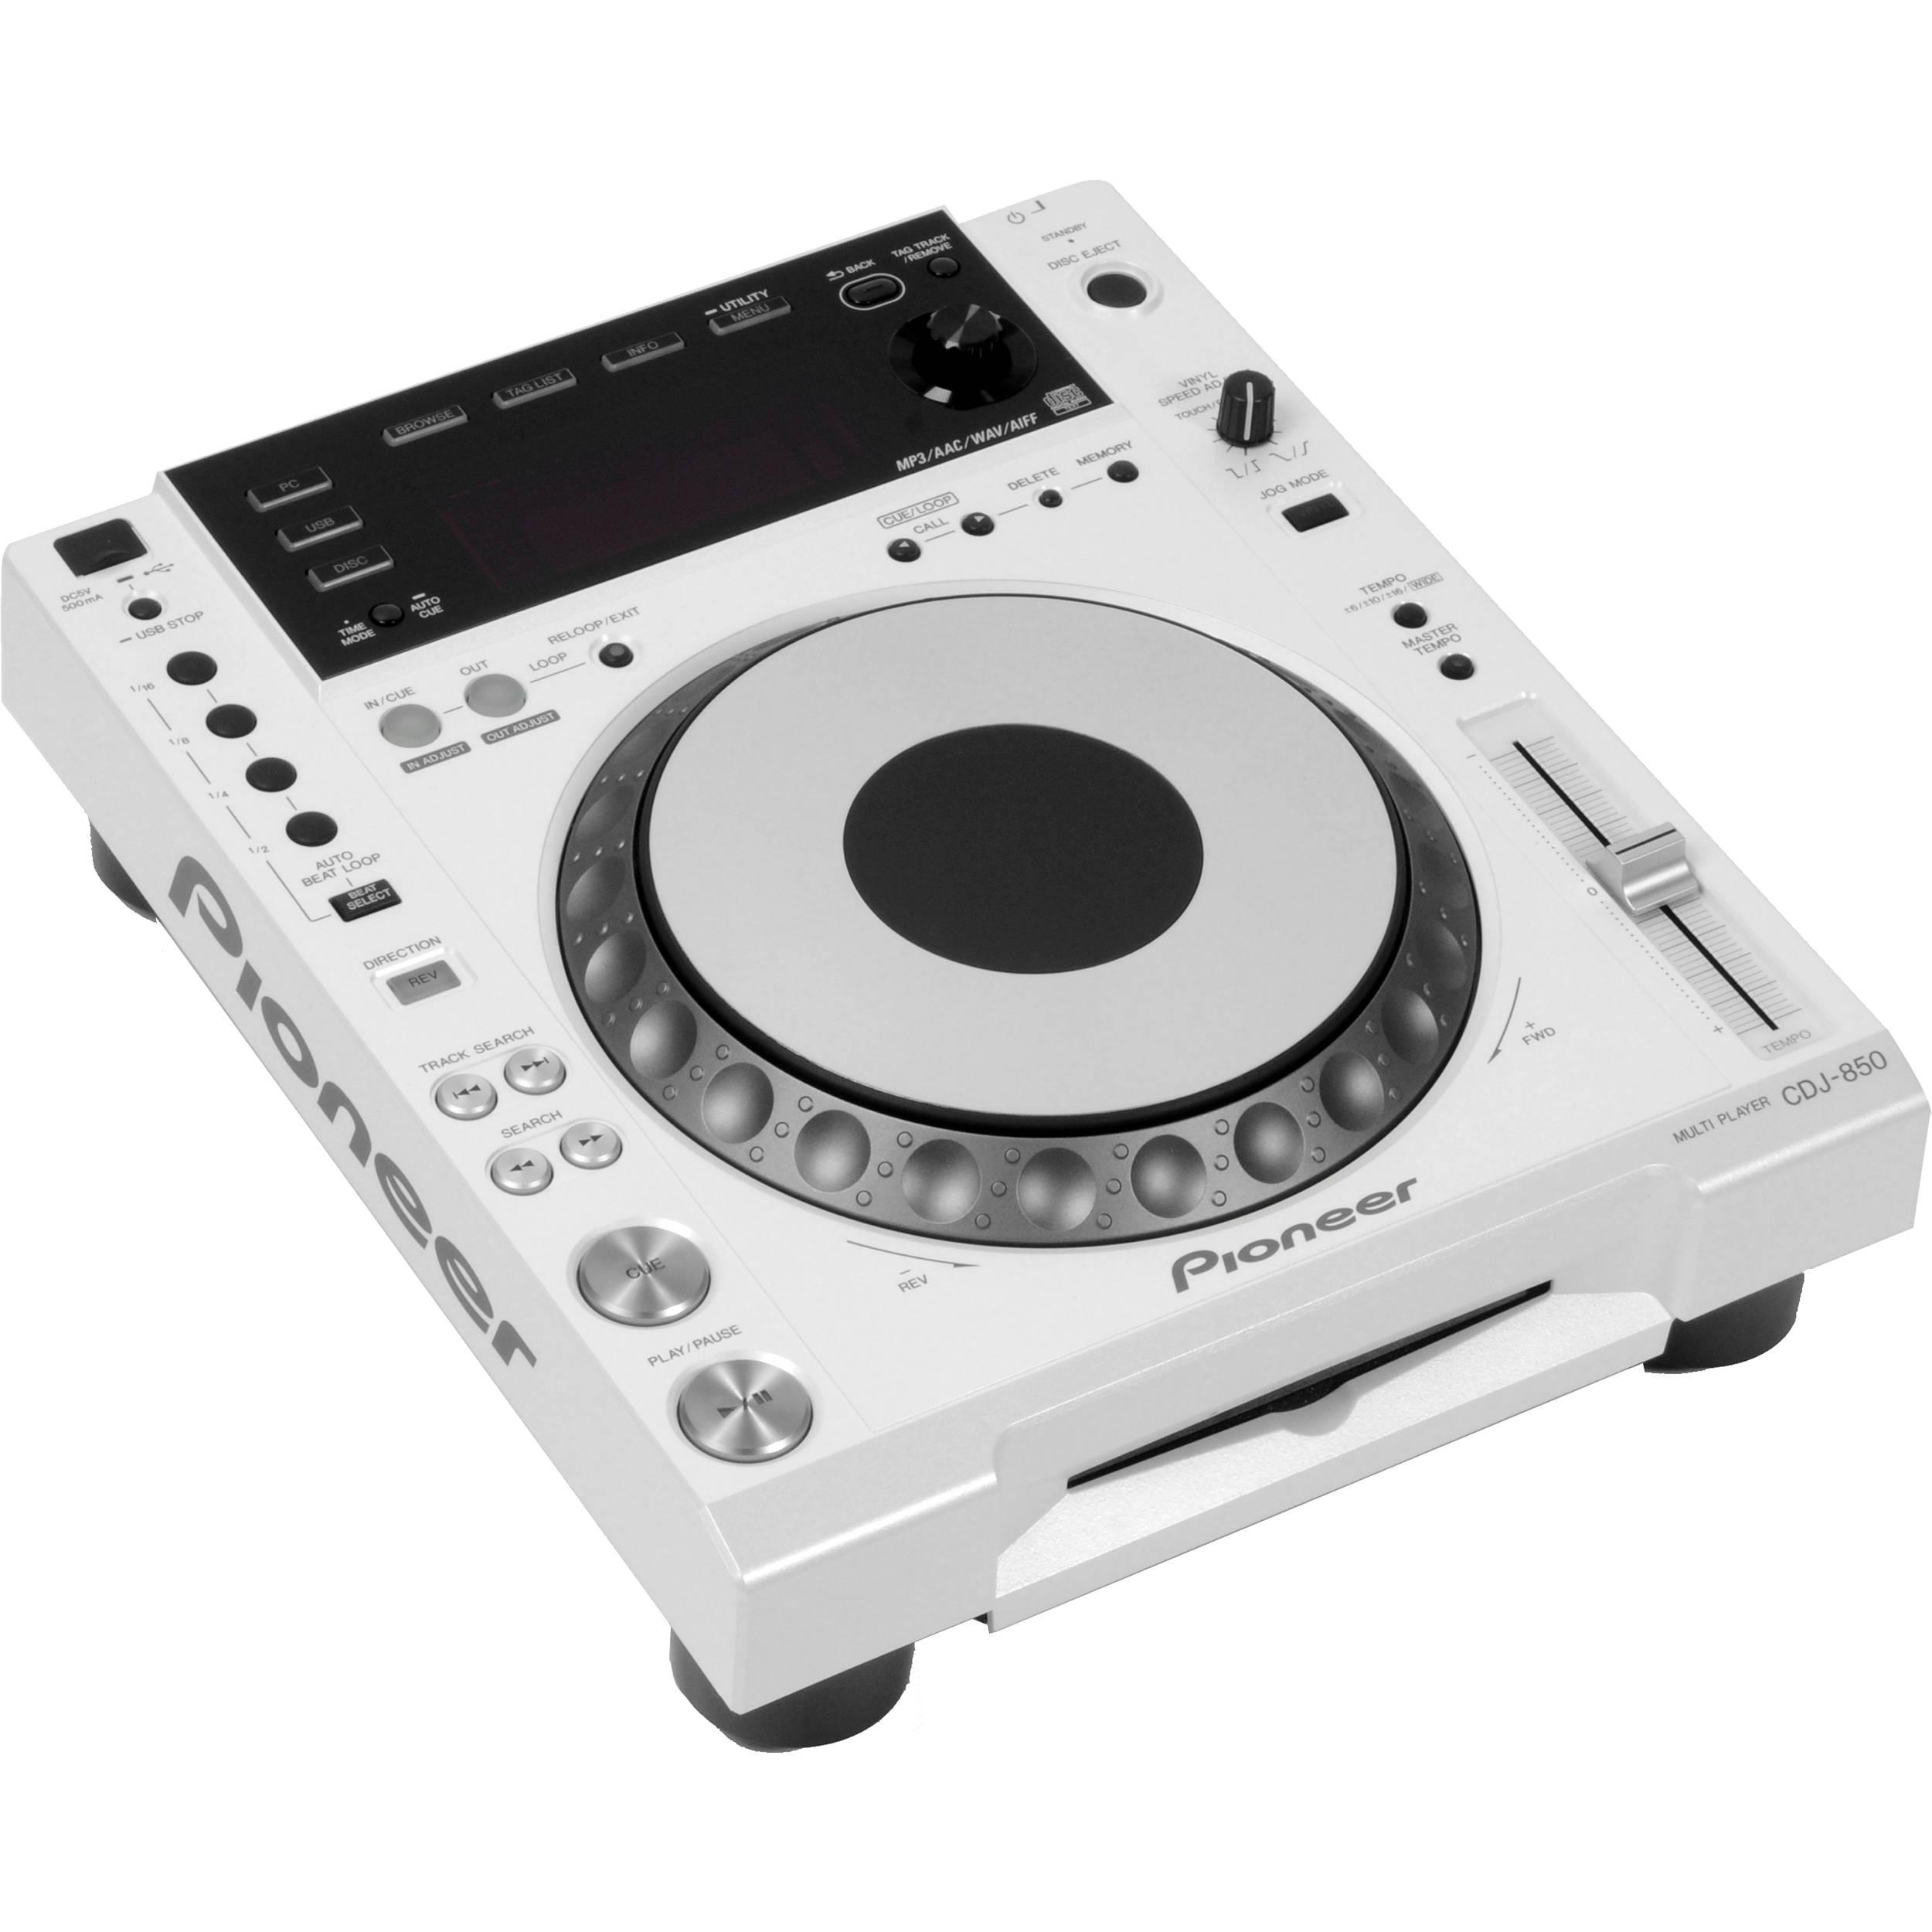 Pioneer CDJ-850 Performance Multi Player (White)